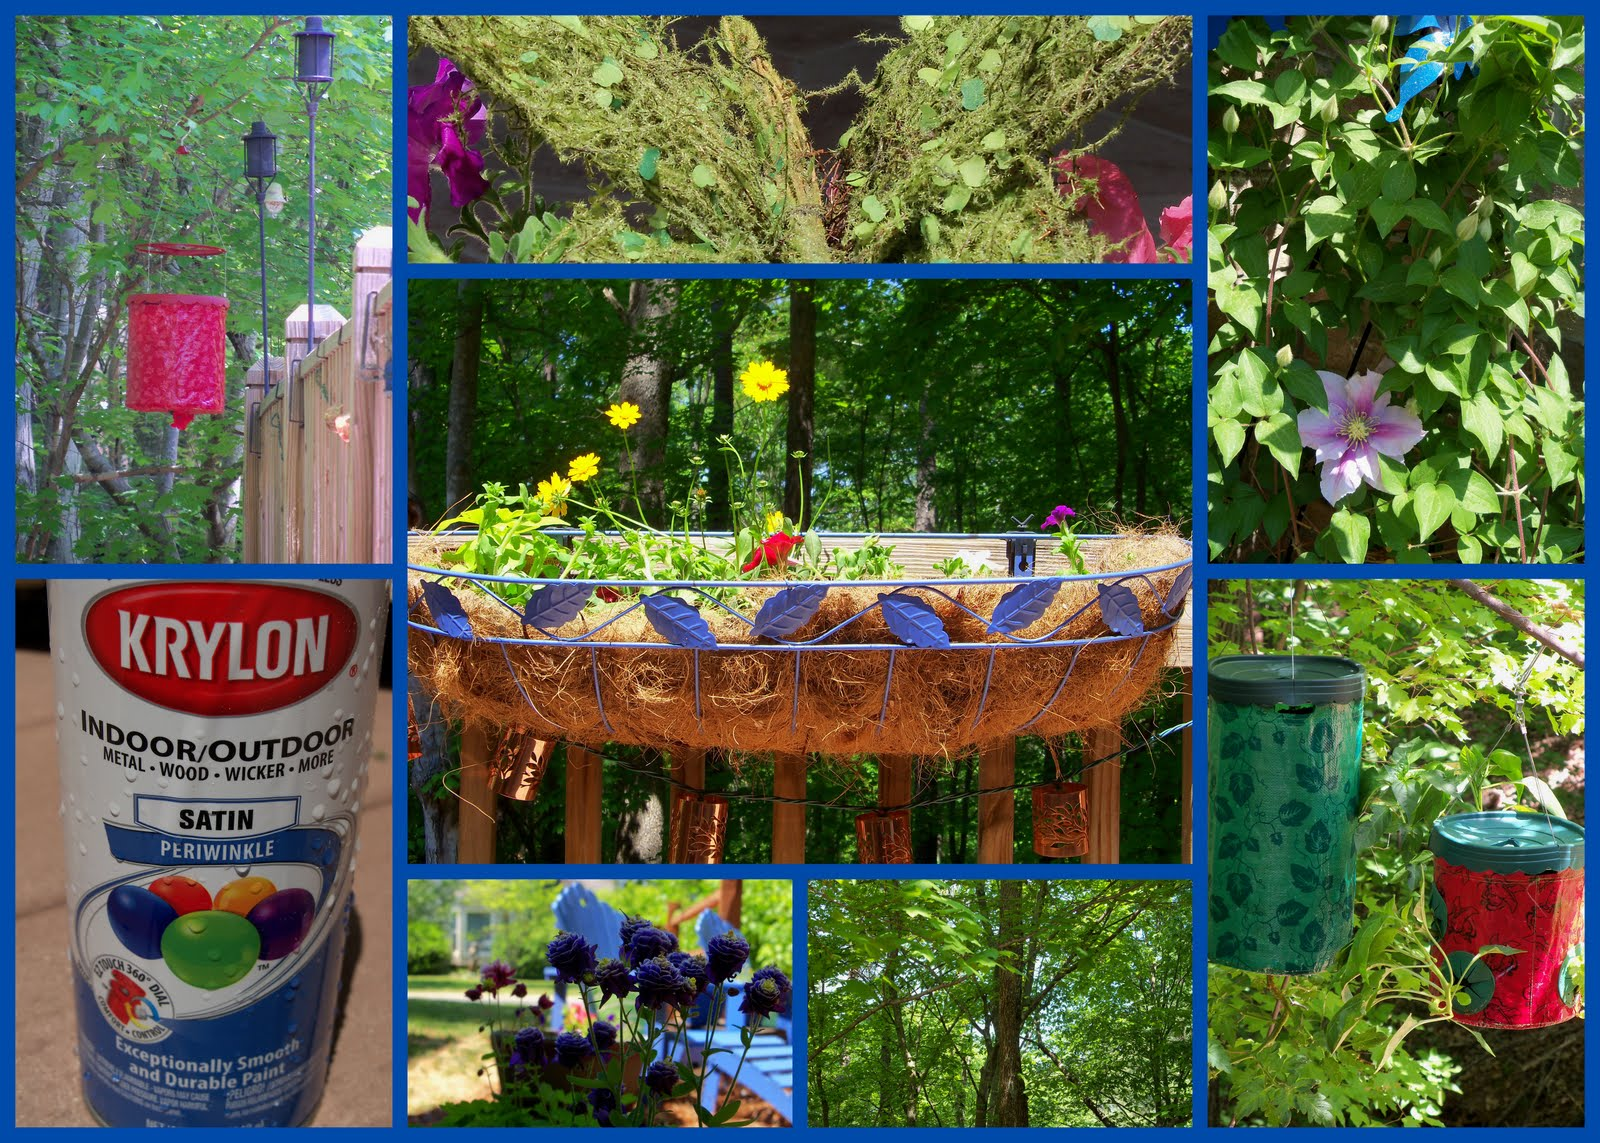 Diy garden decorations - Shed Plans Free X Diy Garden Decor Projects Wooden Plans Garden Idea